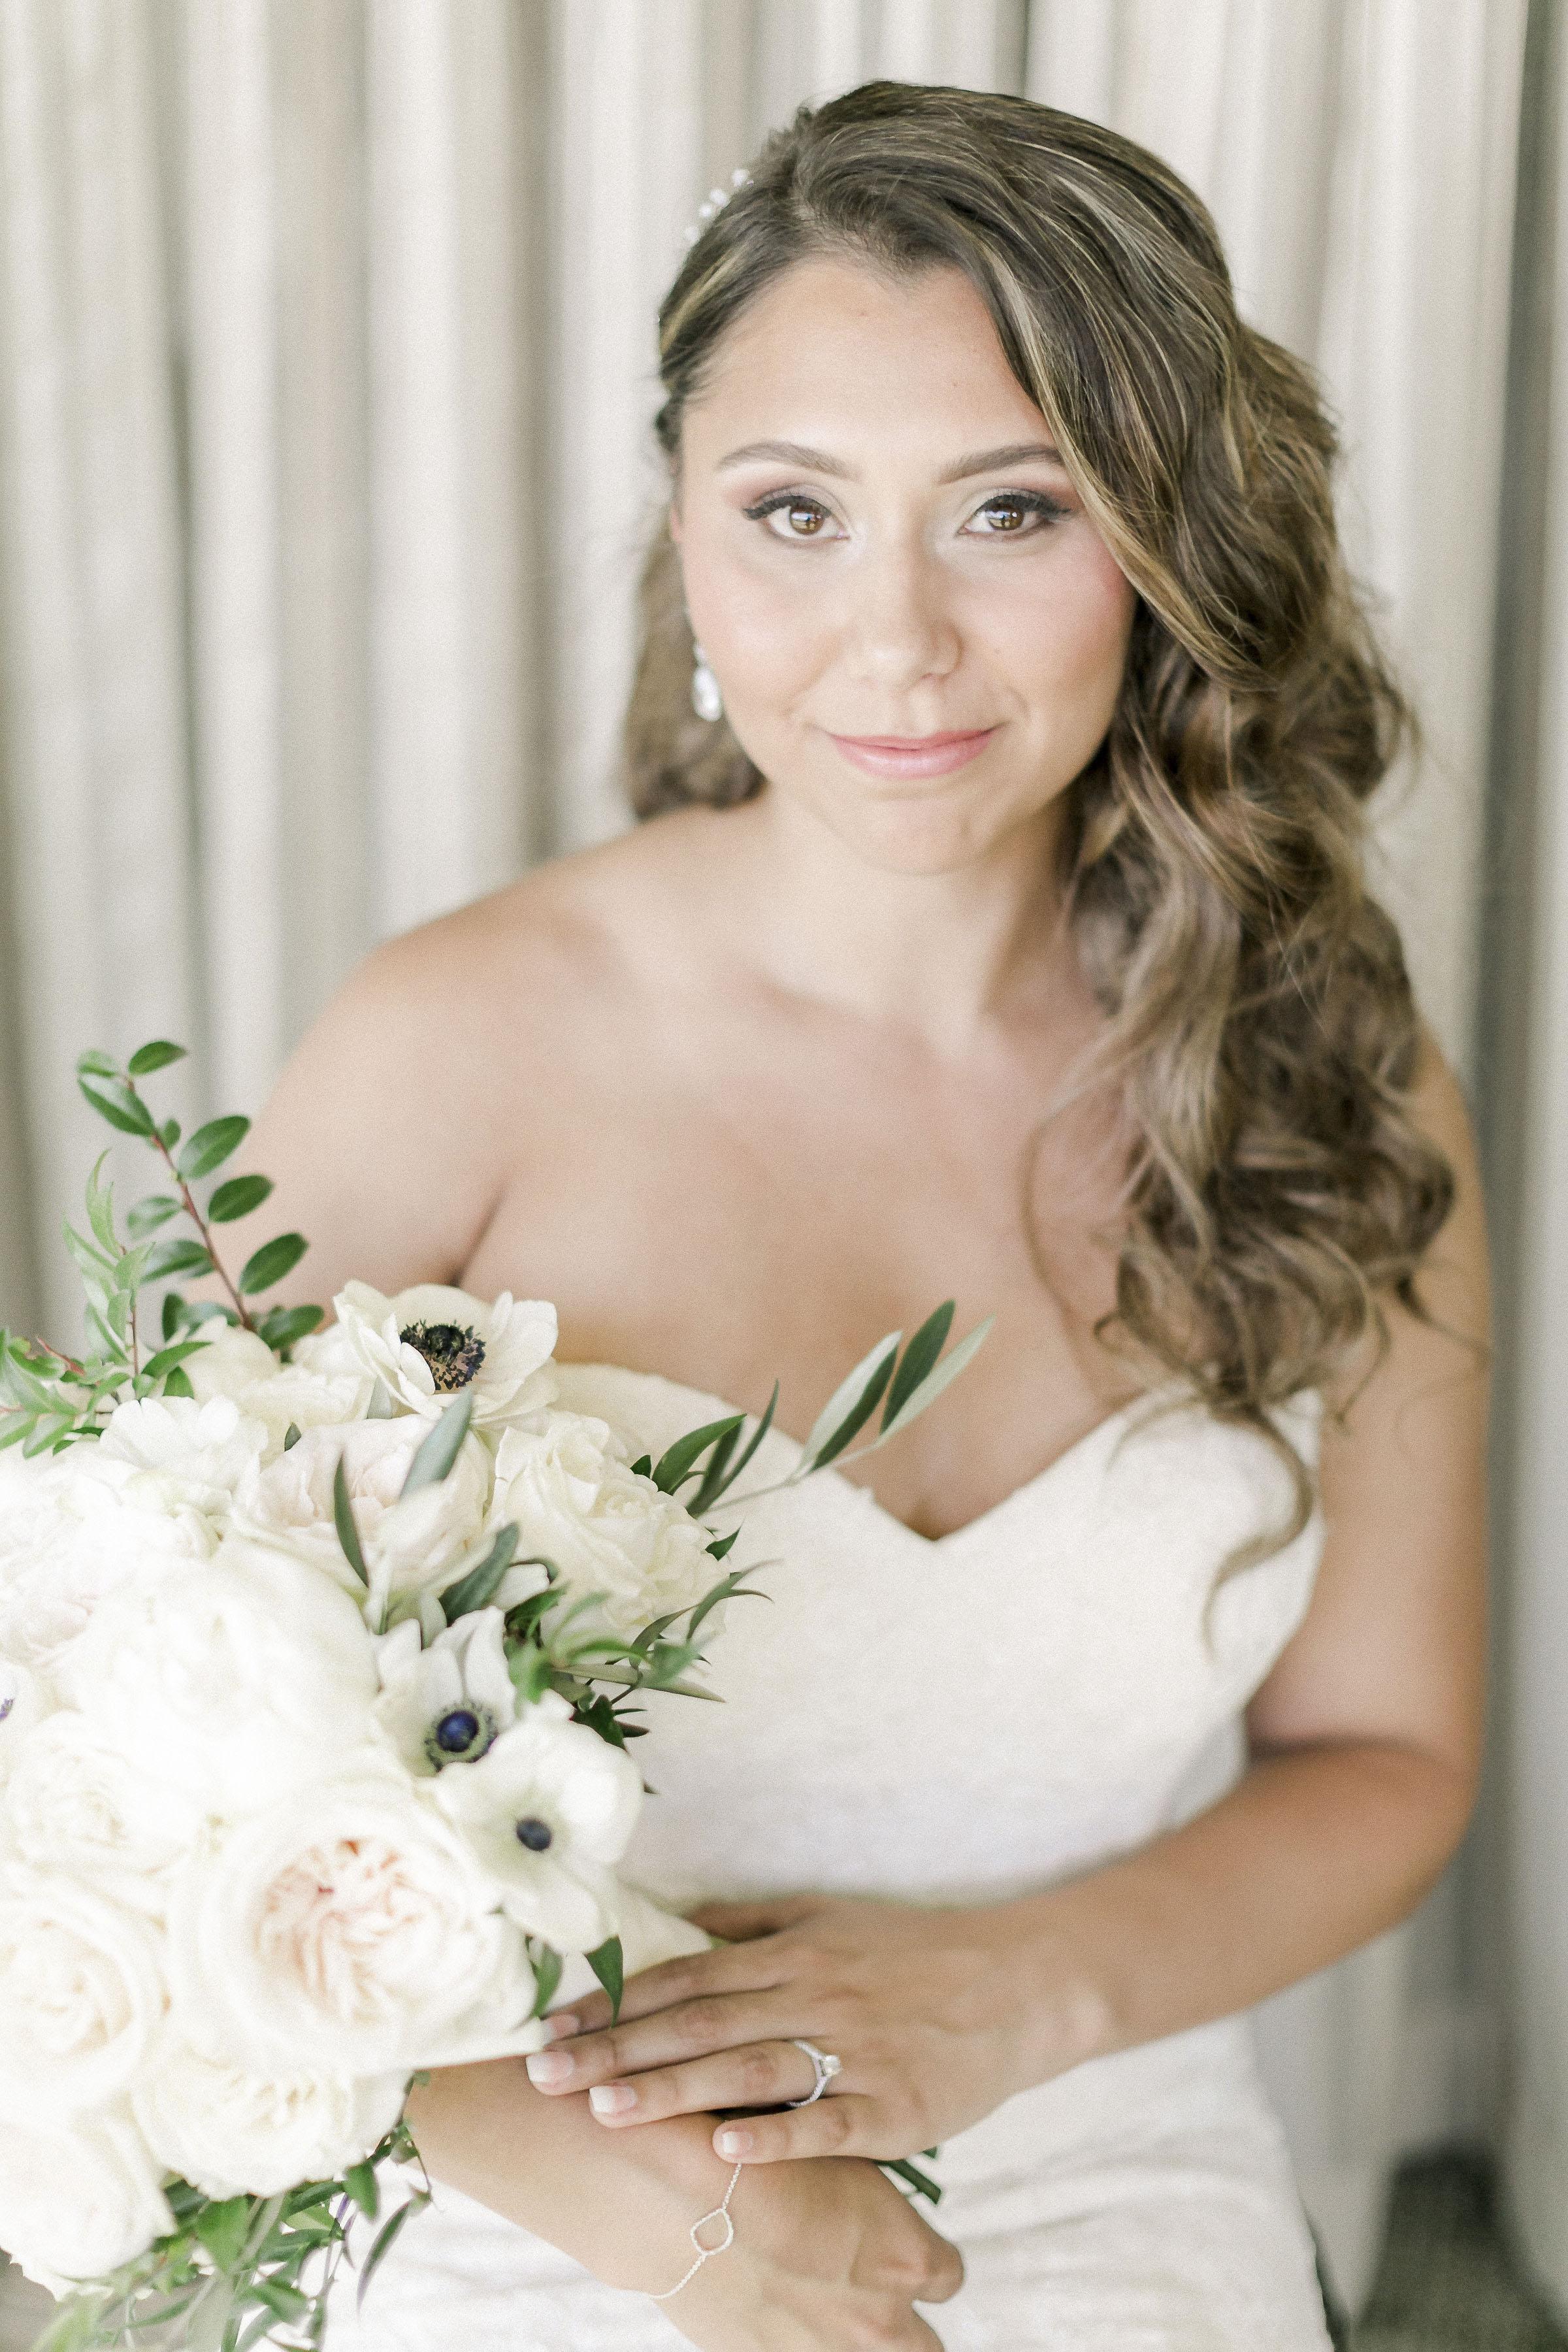 Domenica Beauty _ Hair and Makeup Artist _Wedding _ Temecula, CA _ Samantha and Derek _ 24.JPG